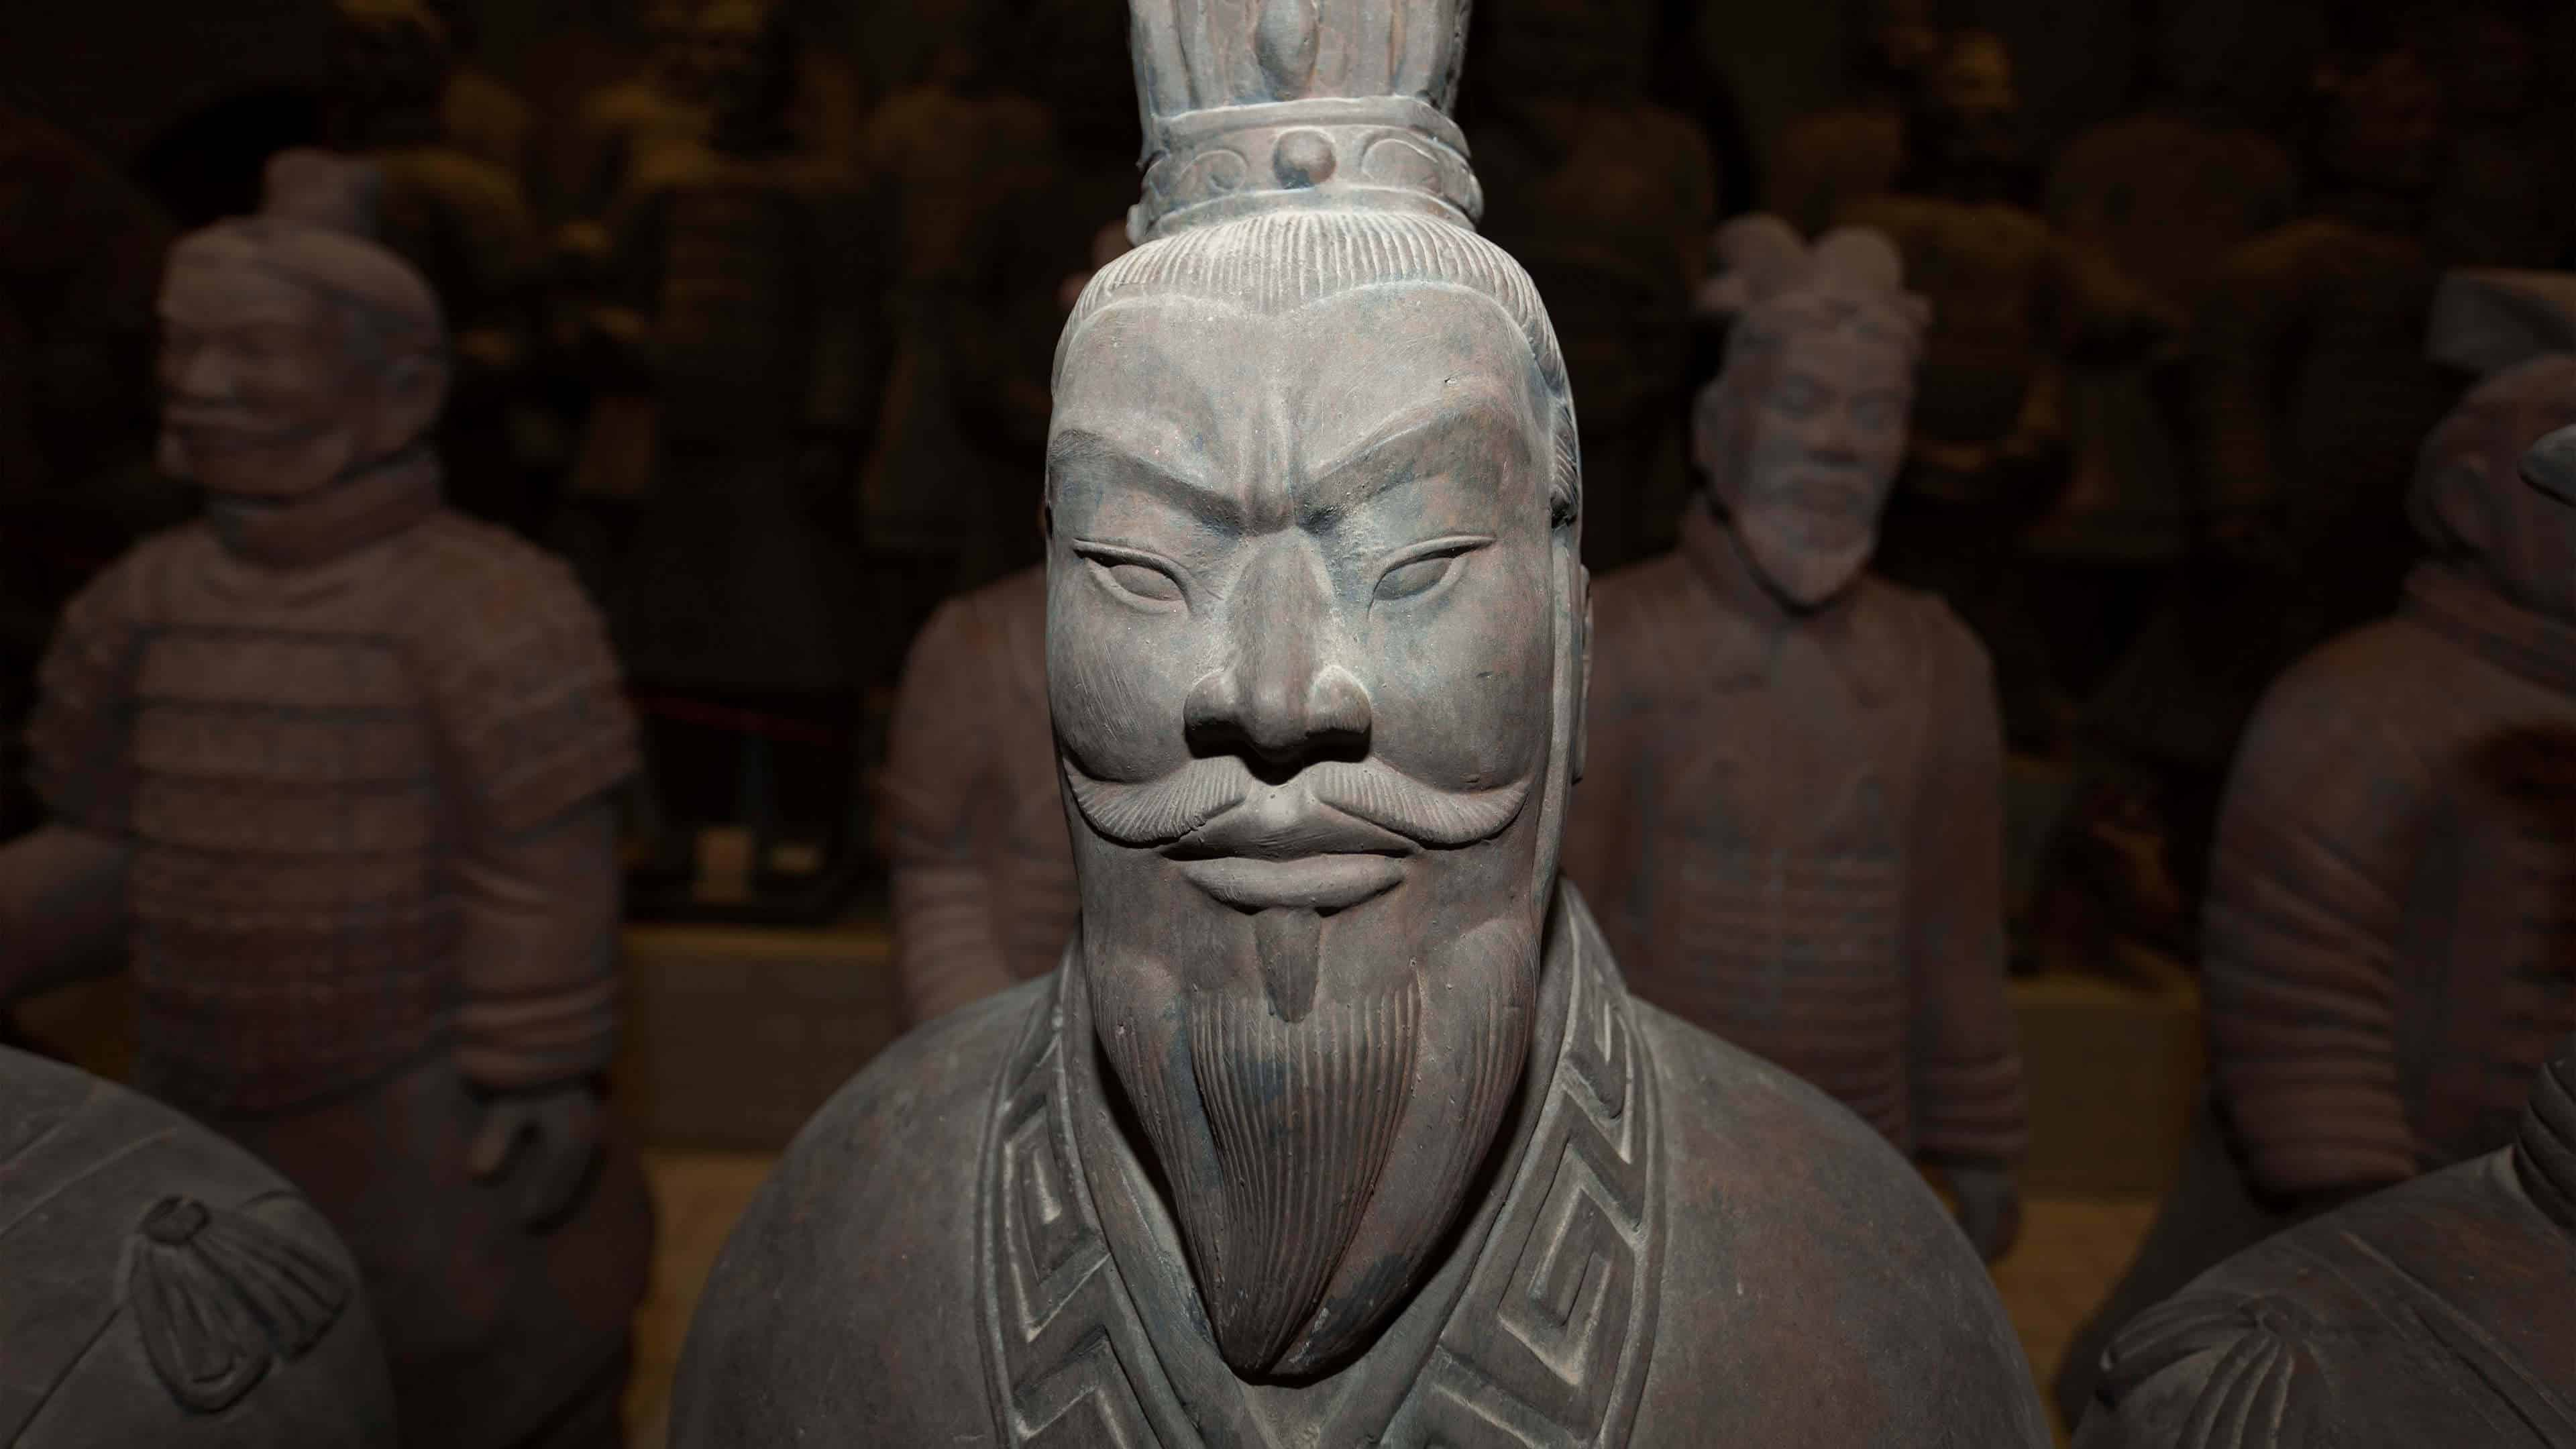 terracotta army statue china uhd 4k wallpaper